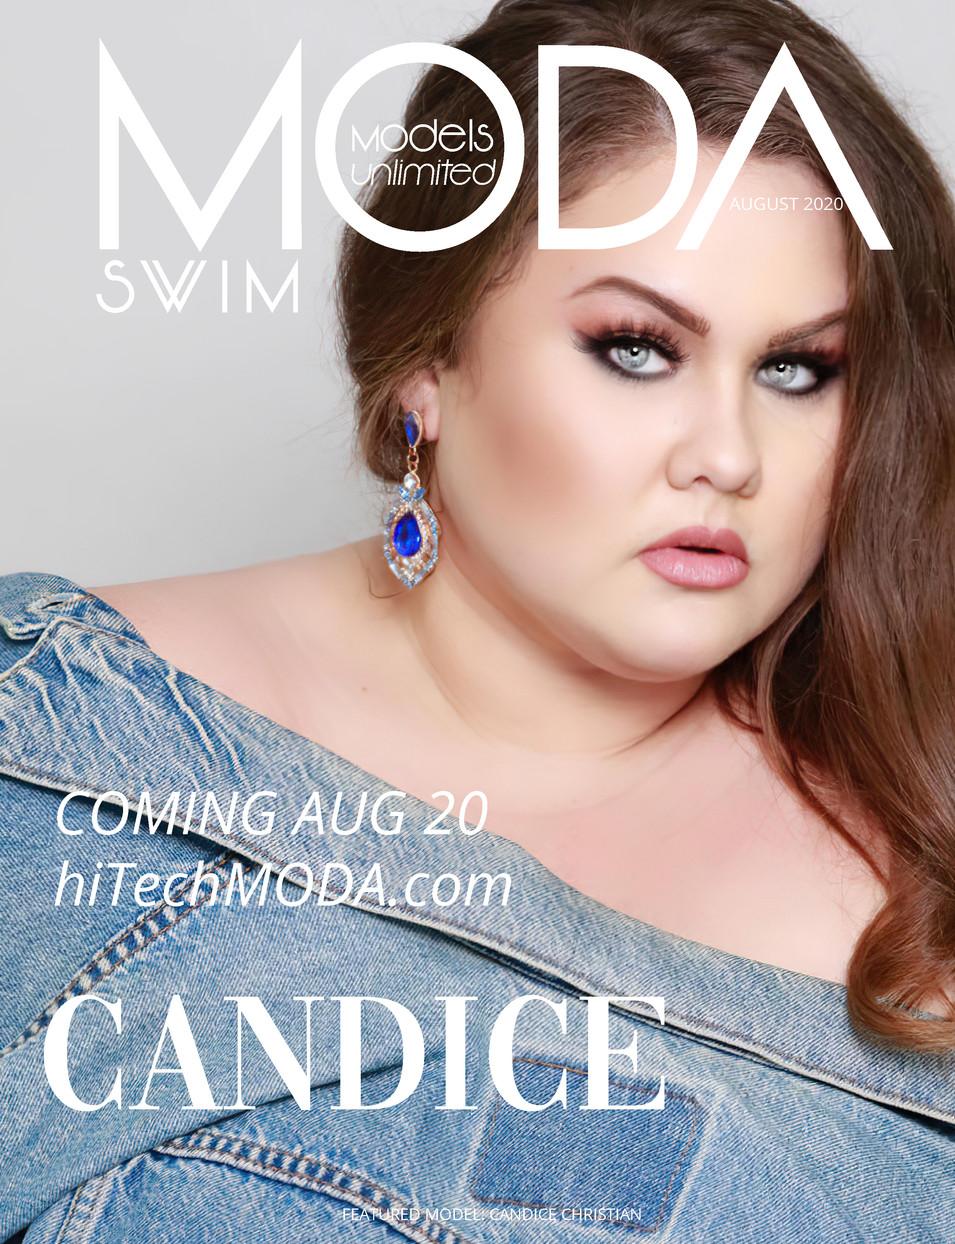 Moda Models Unlimited Swim Issue Candice